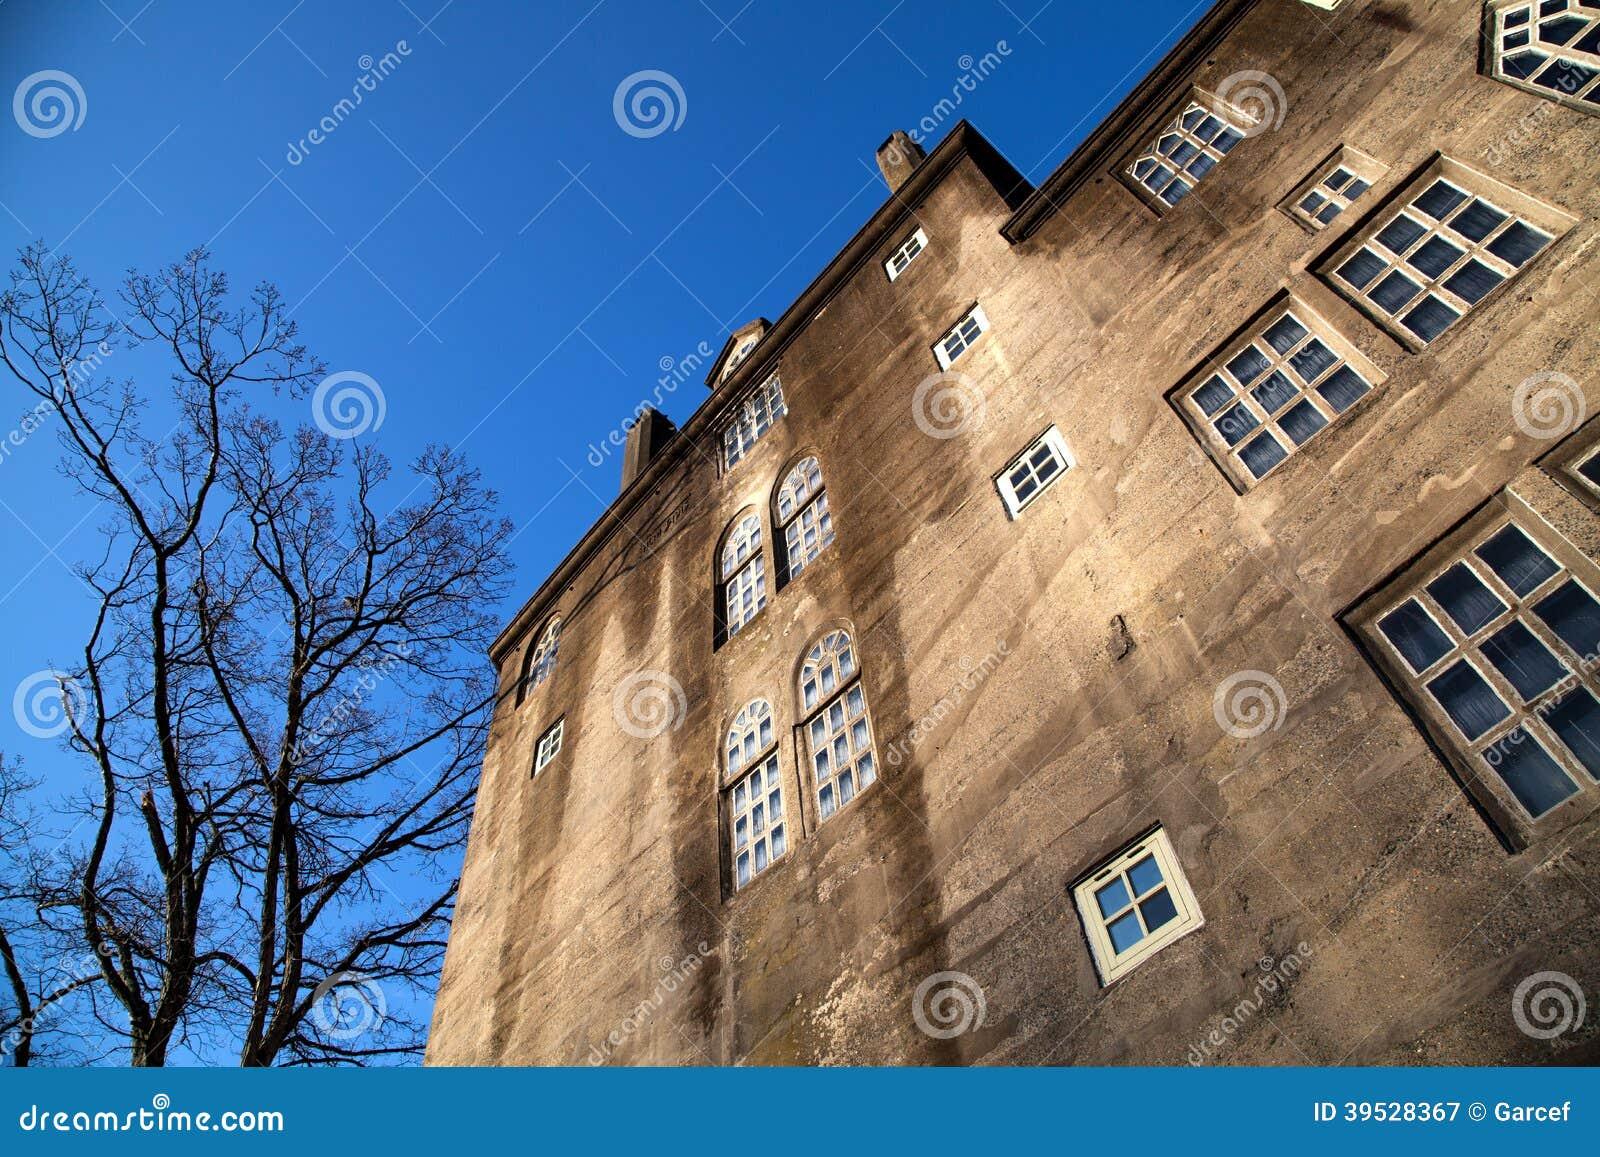 Concrete Building With Windows : Concrete building with windows stock photo image